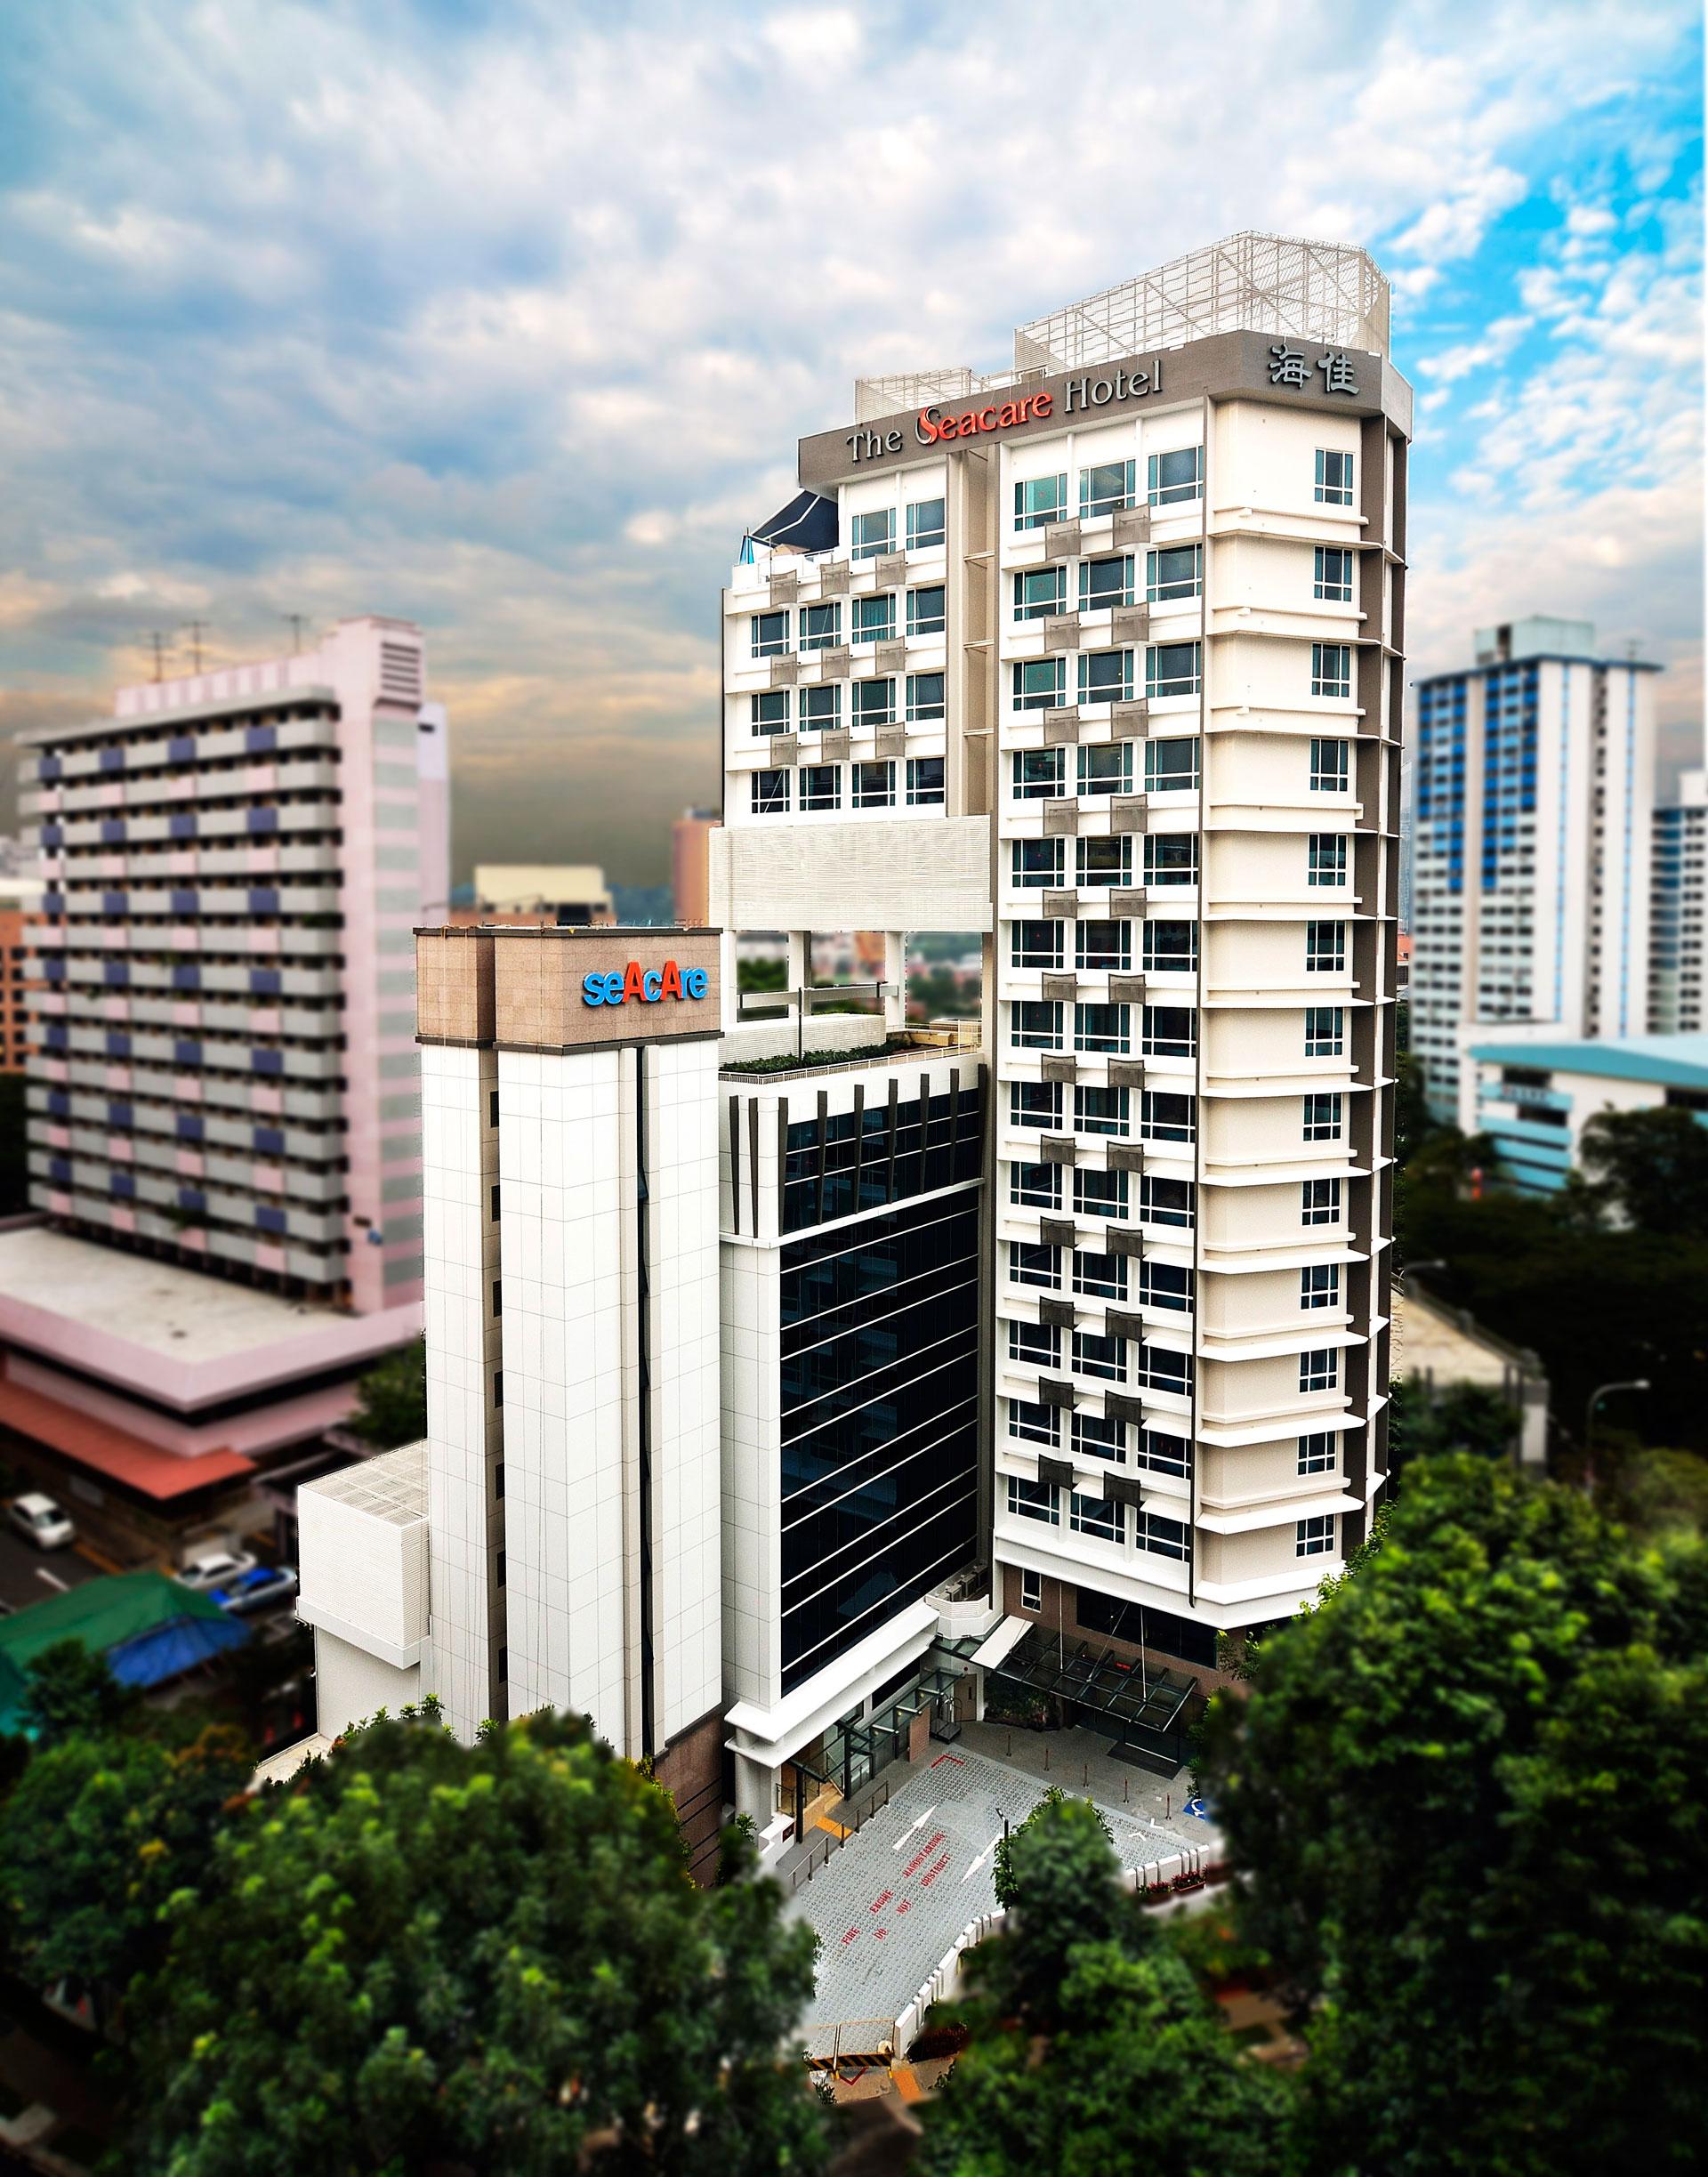 Seacare hotel building